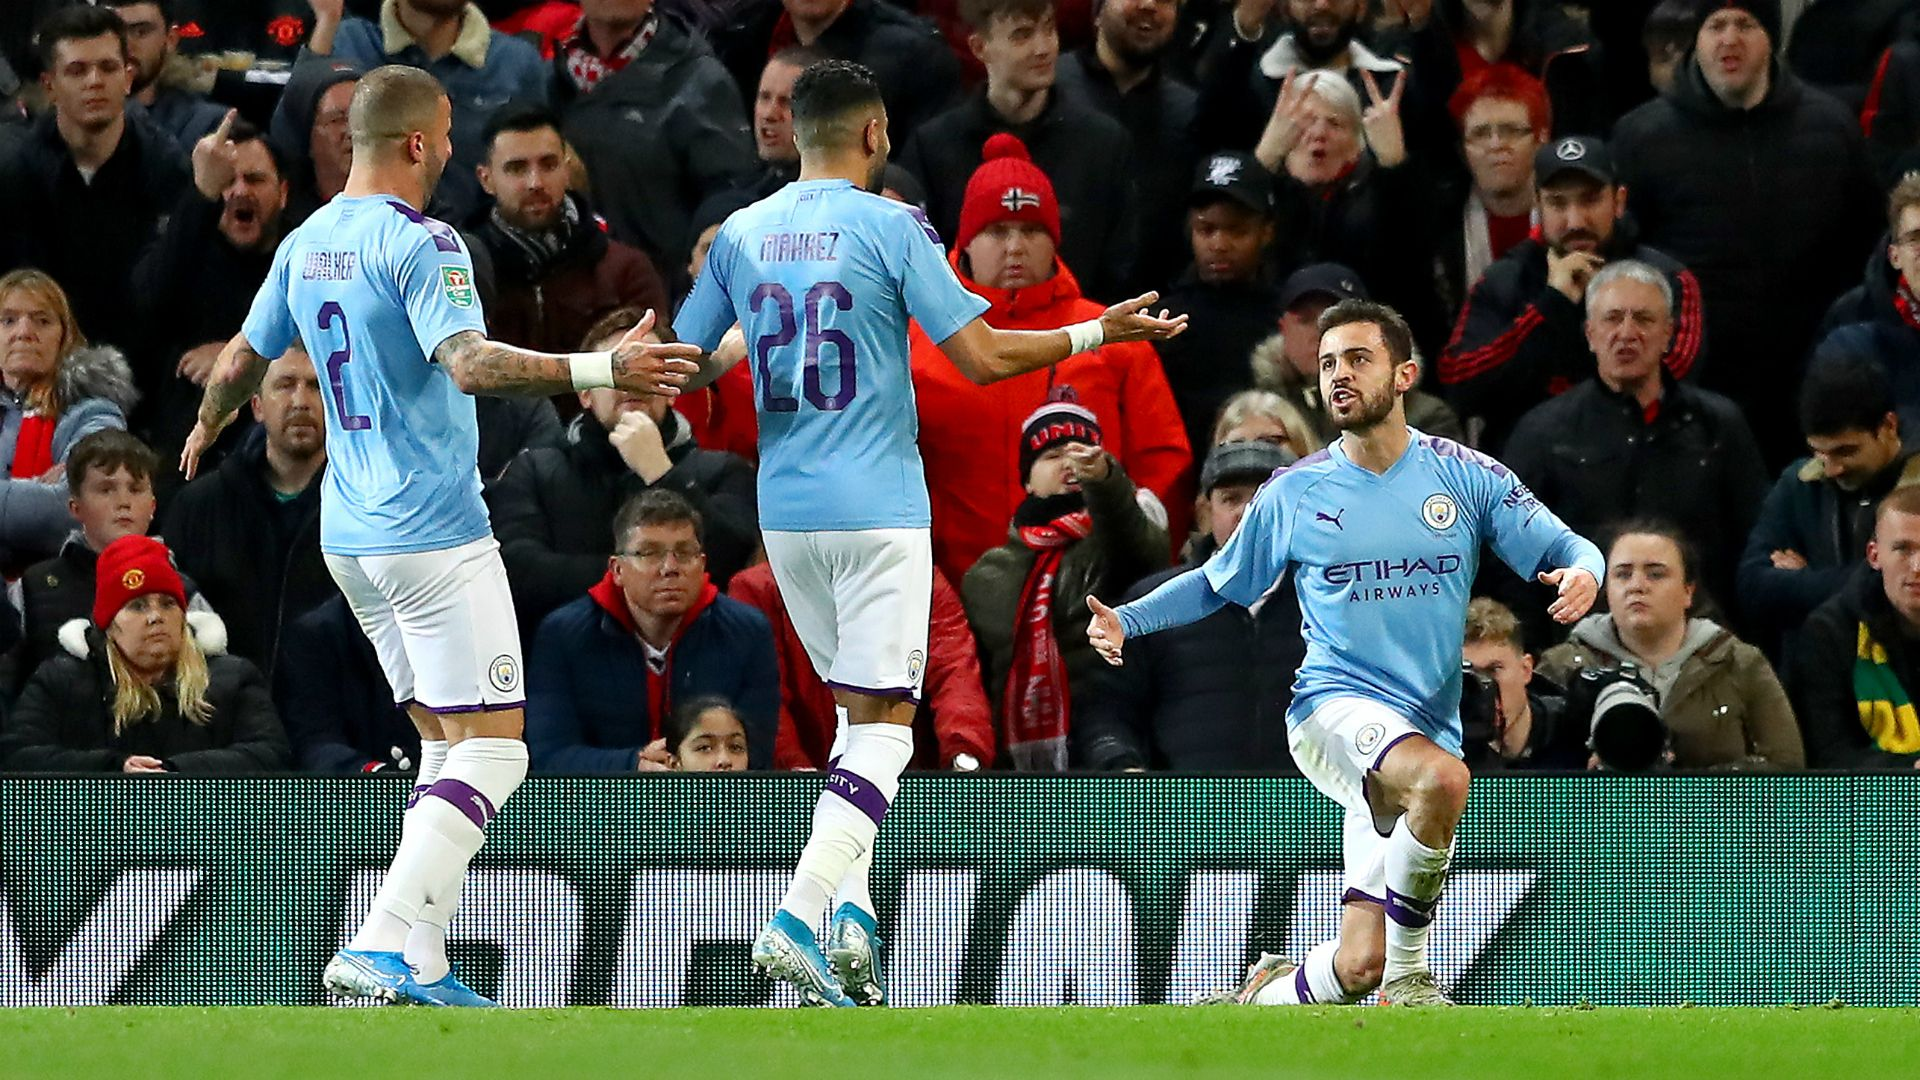 Manchester United V Manchester City Match Report 07 01 2020 League Cup En 2020